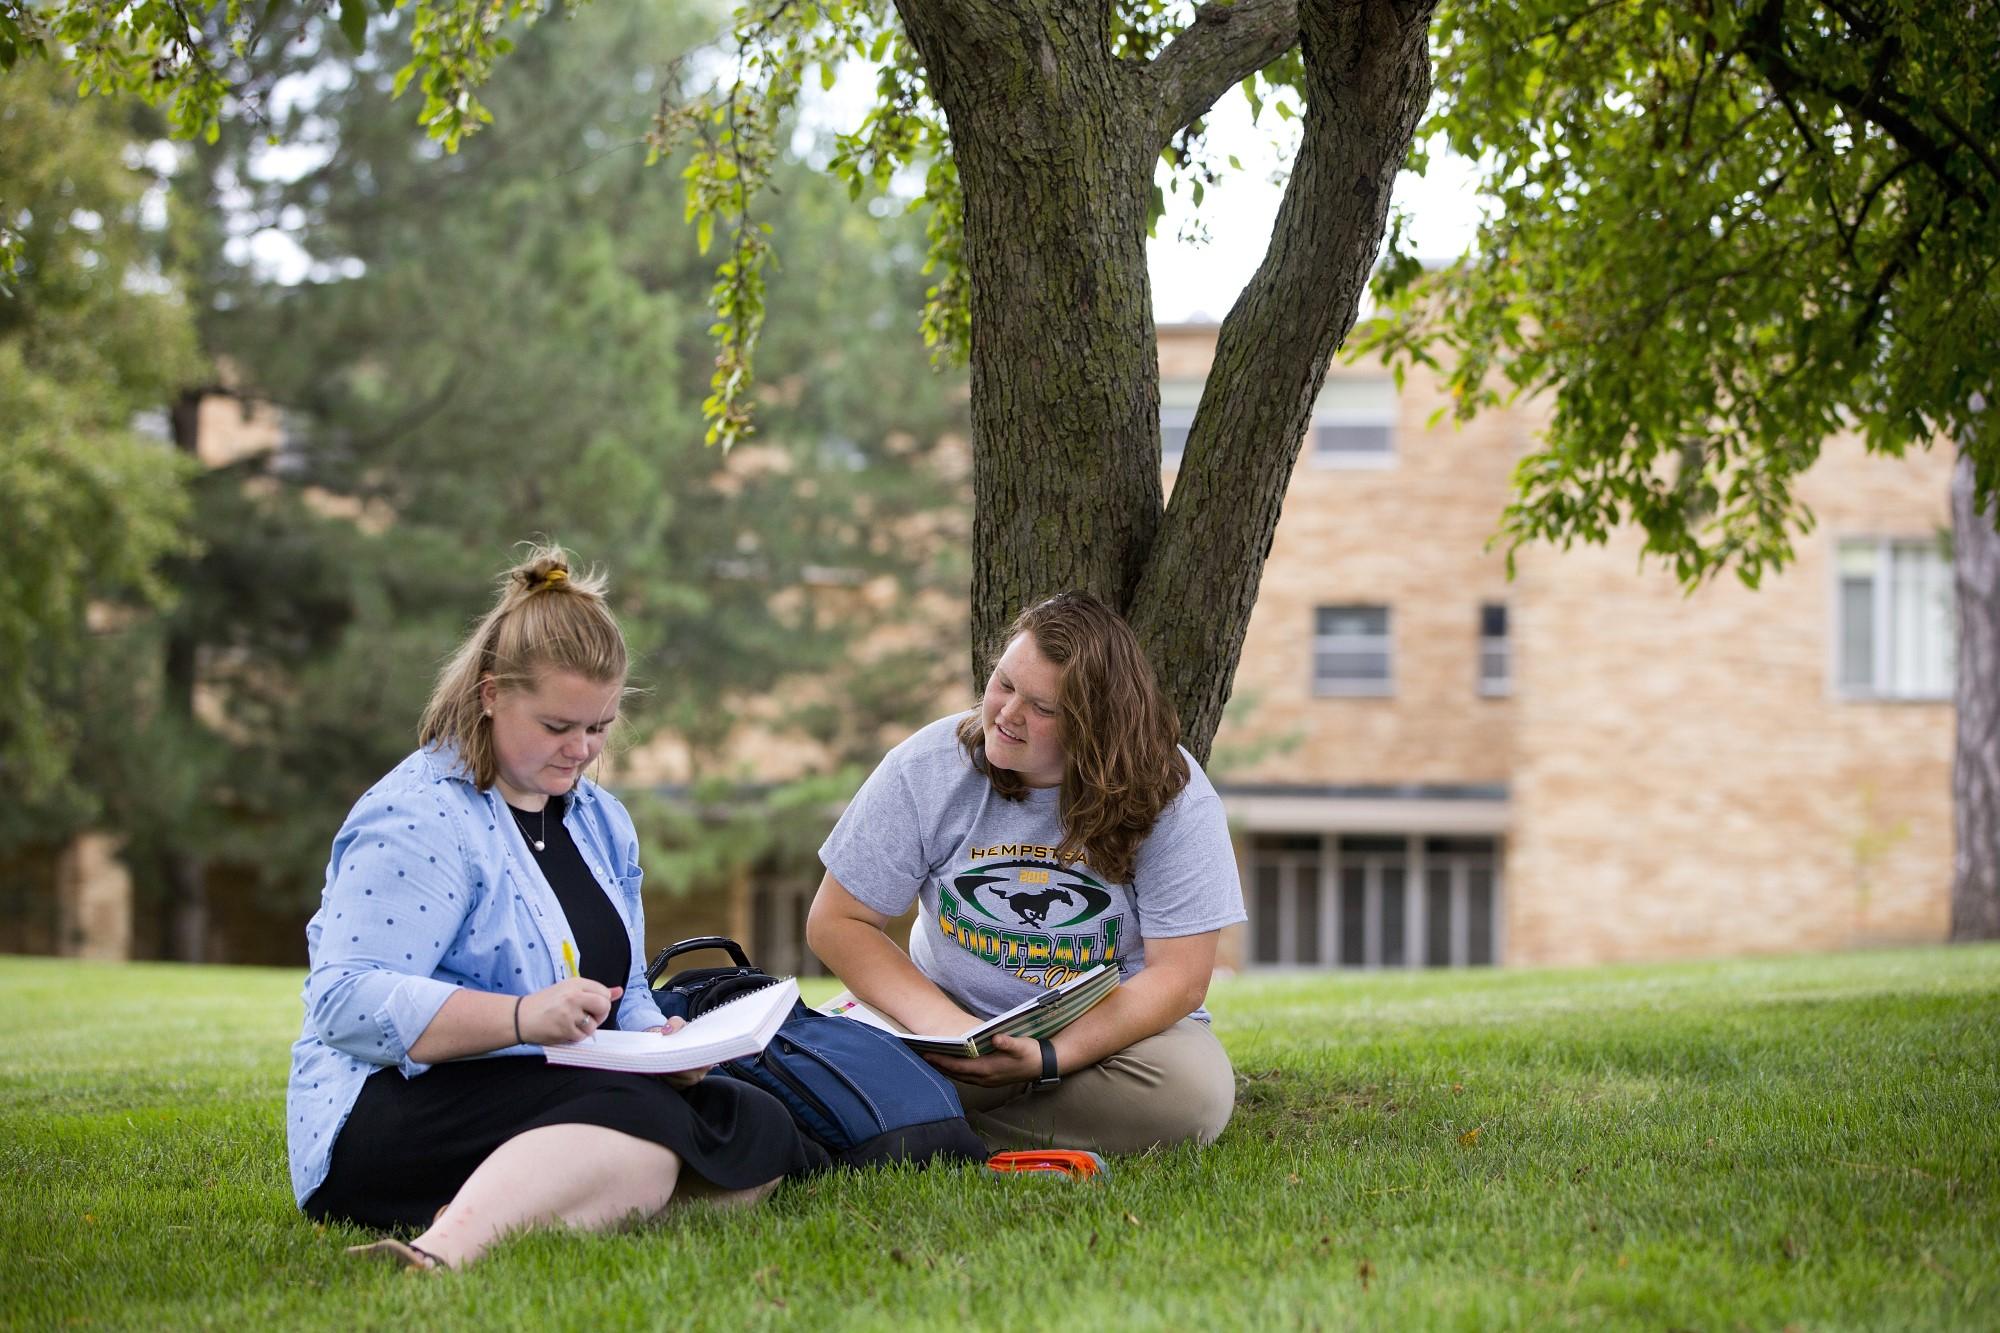 Clarke University Senior Philosophy Major students studying on Clarke's campus.